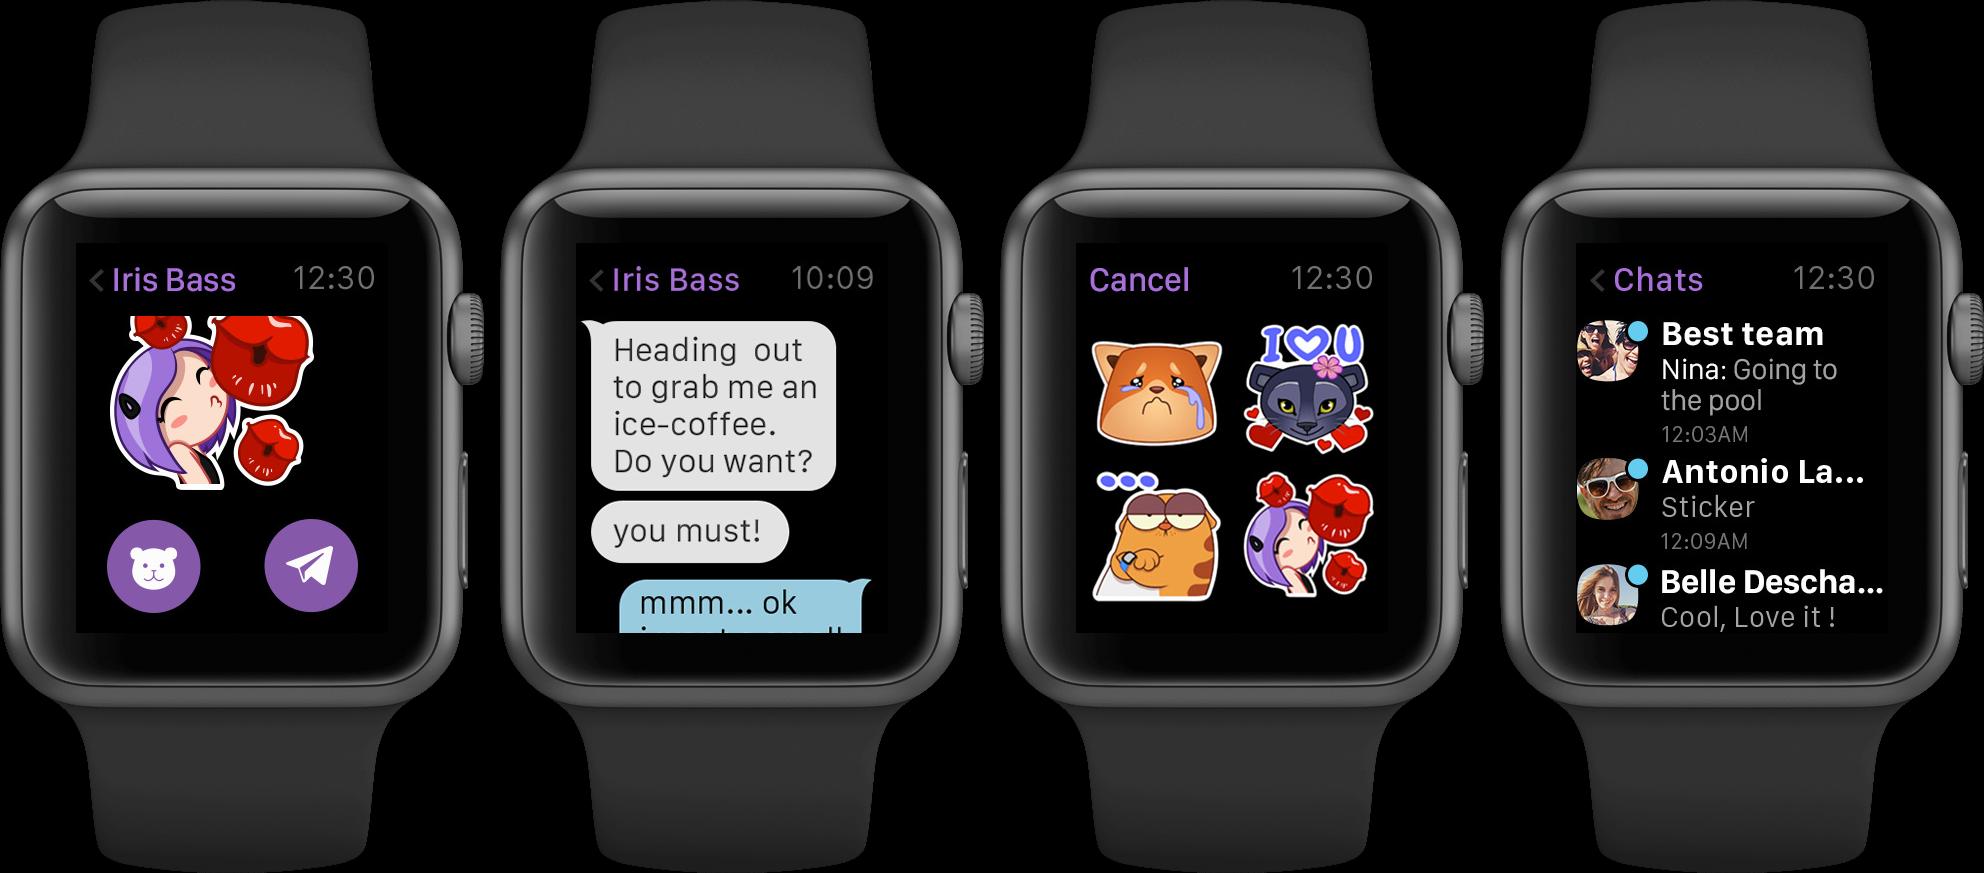 Viber for Apple Watch Viber officialise son compagnon sur lApple Watch